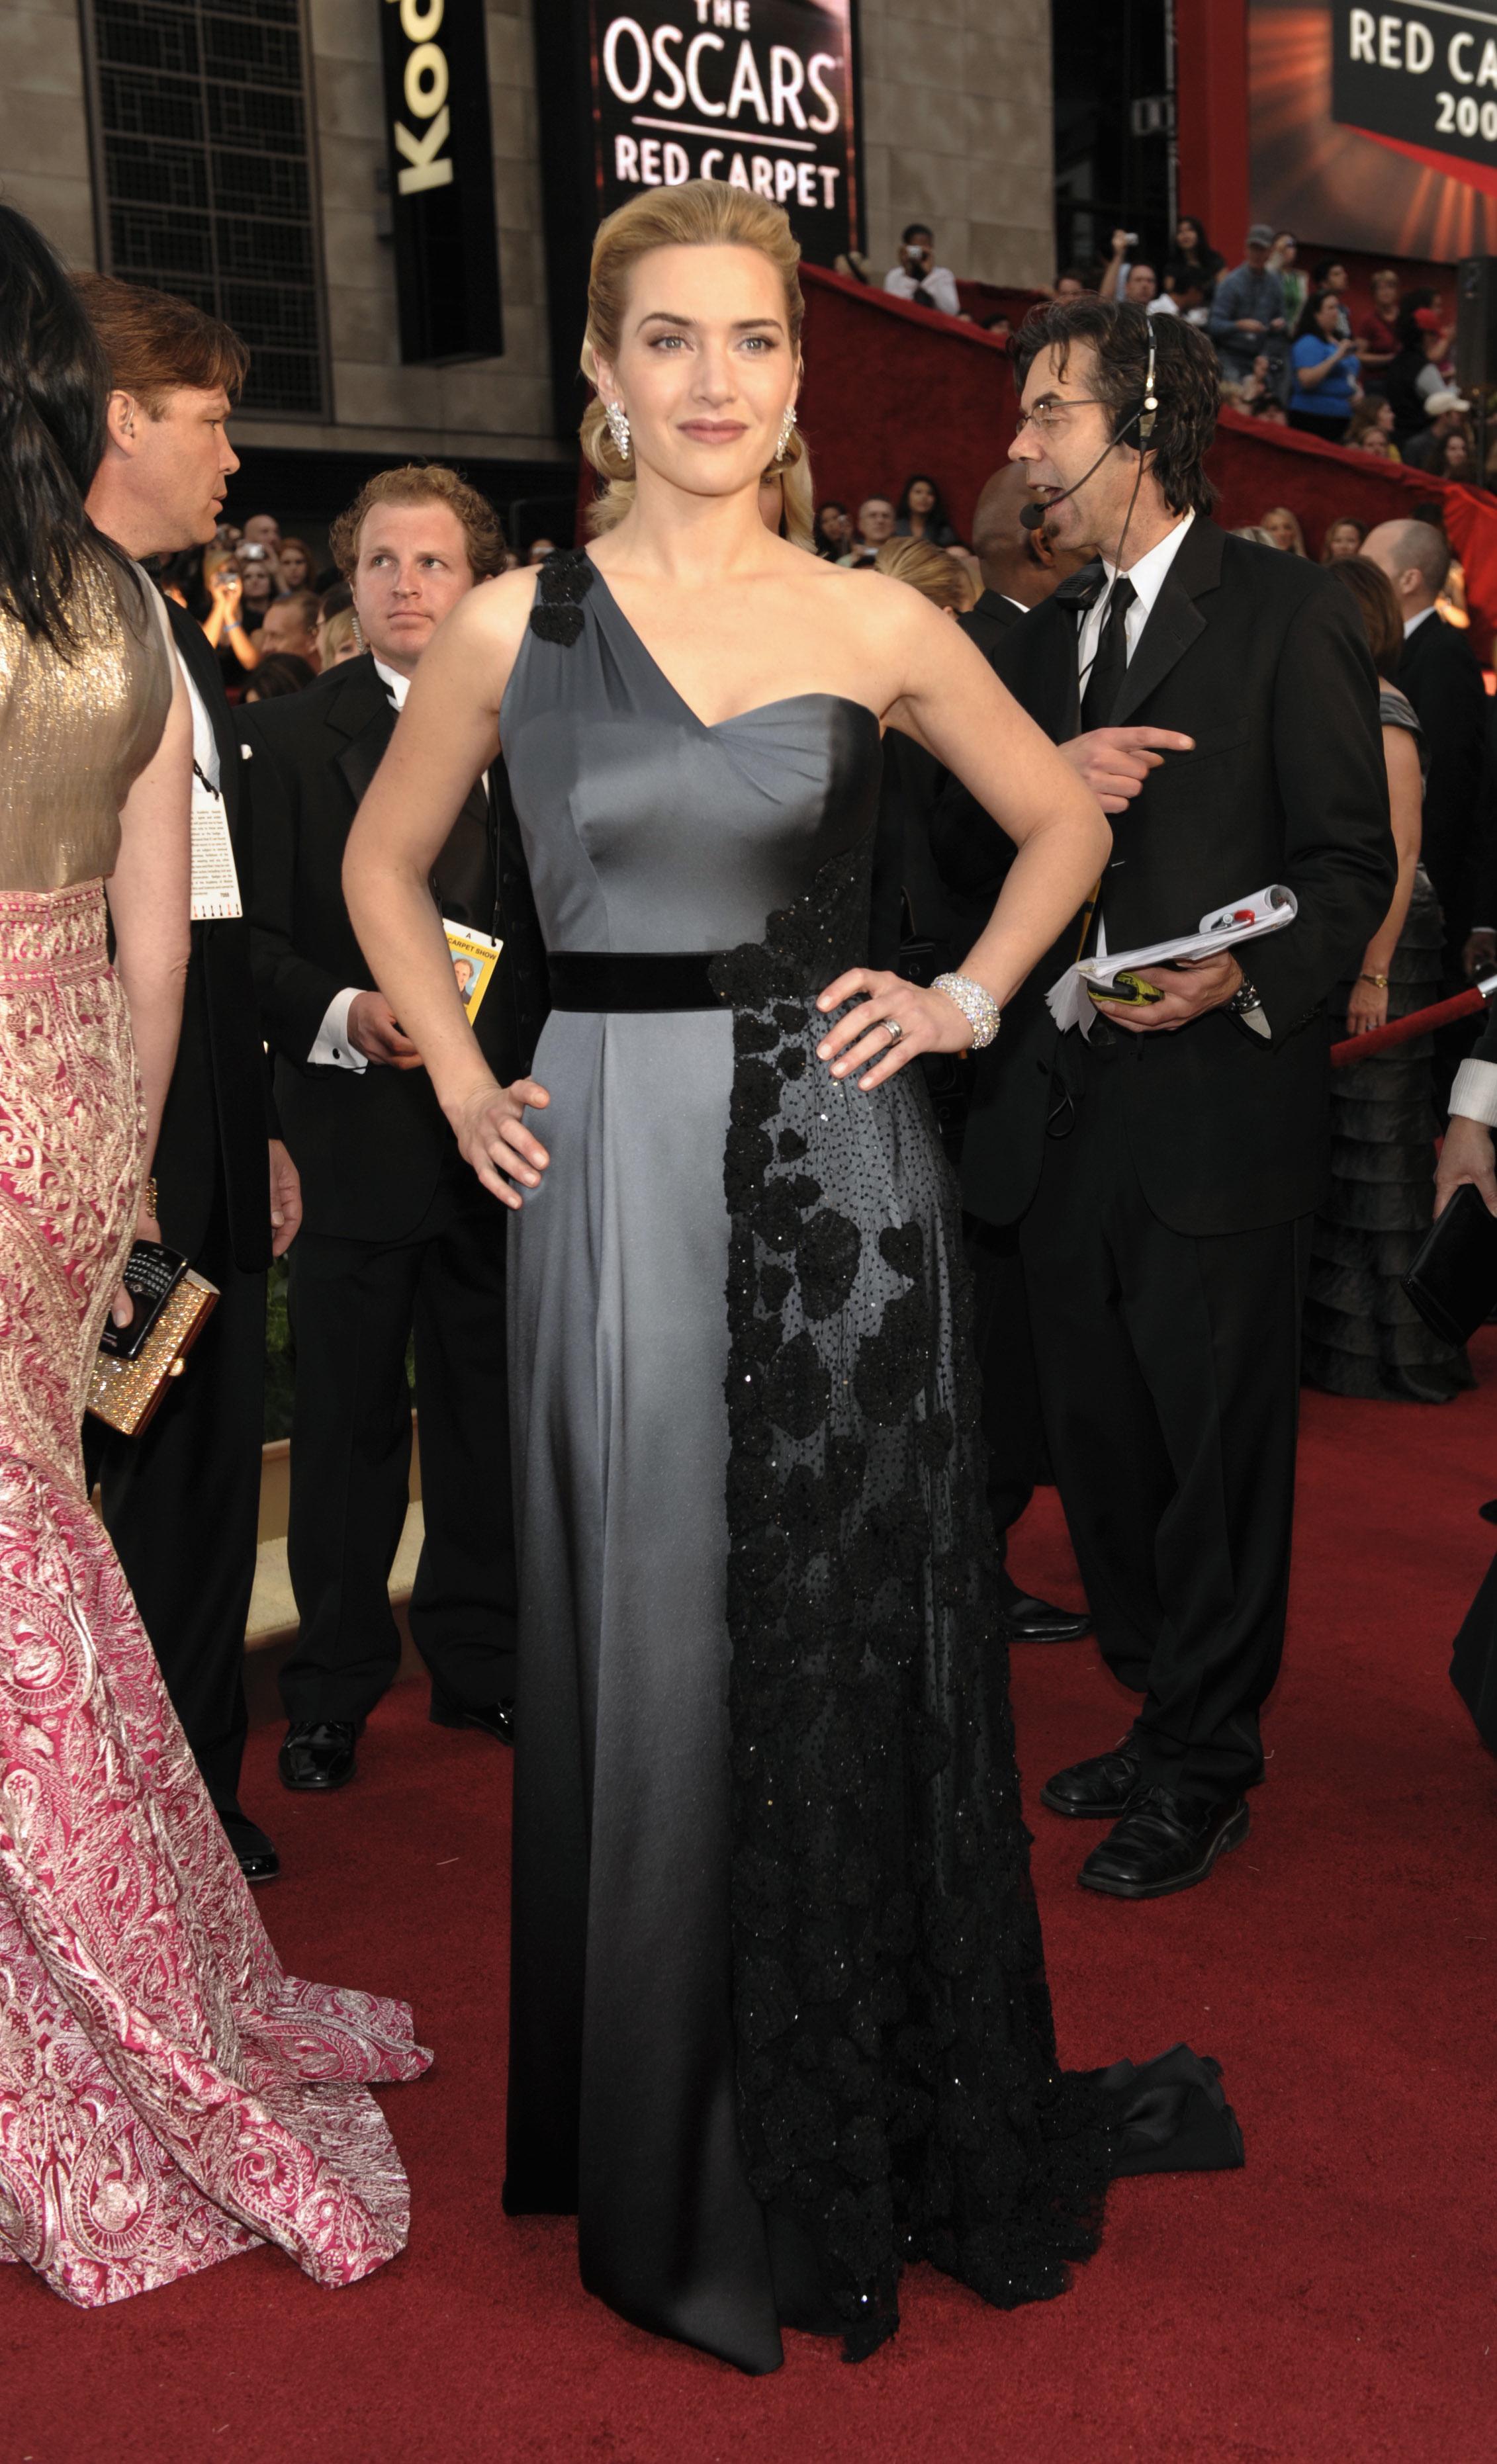 Gwyneth Paltrow Kate Winslet Oscars